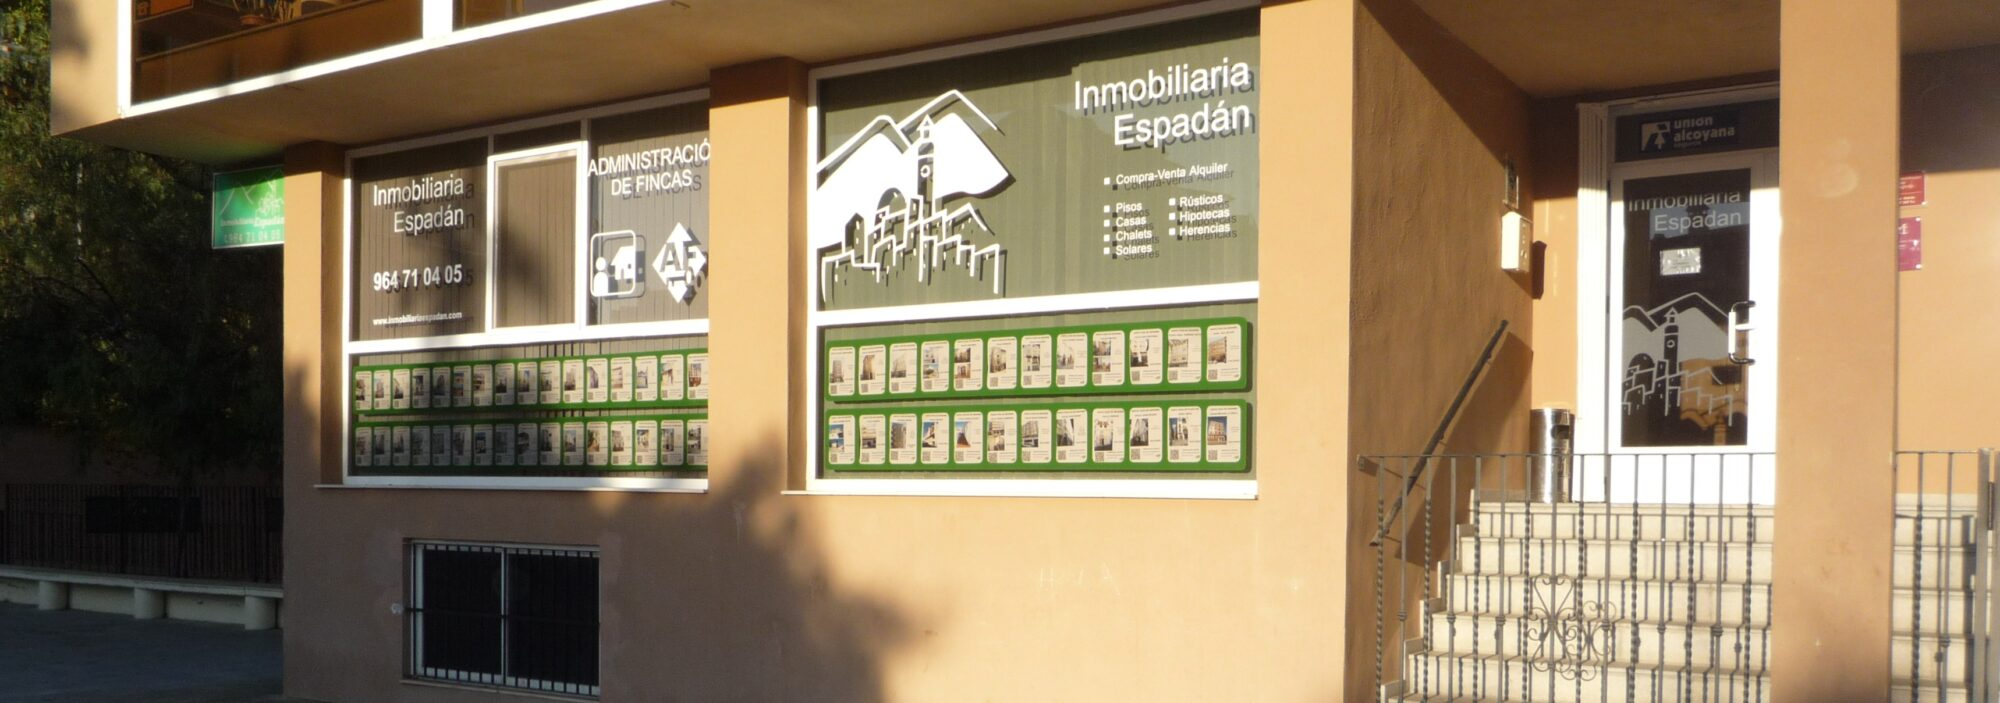 Inmobiliaria Espadán